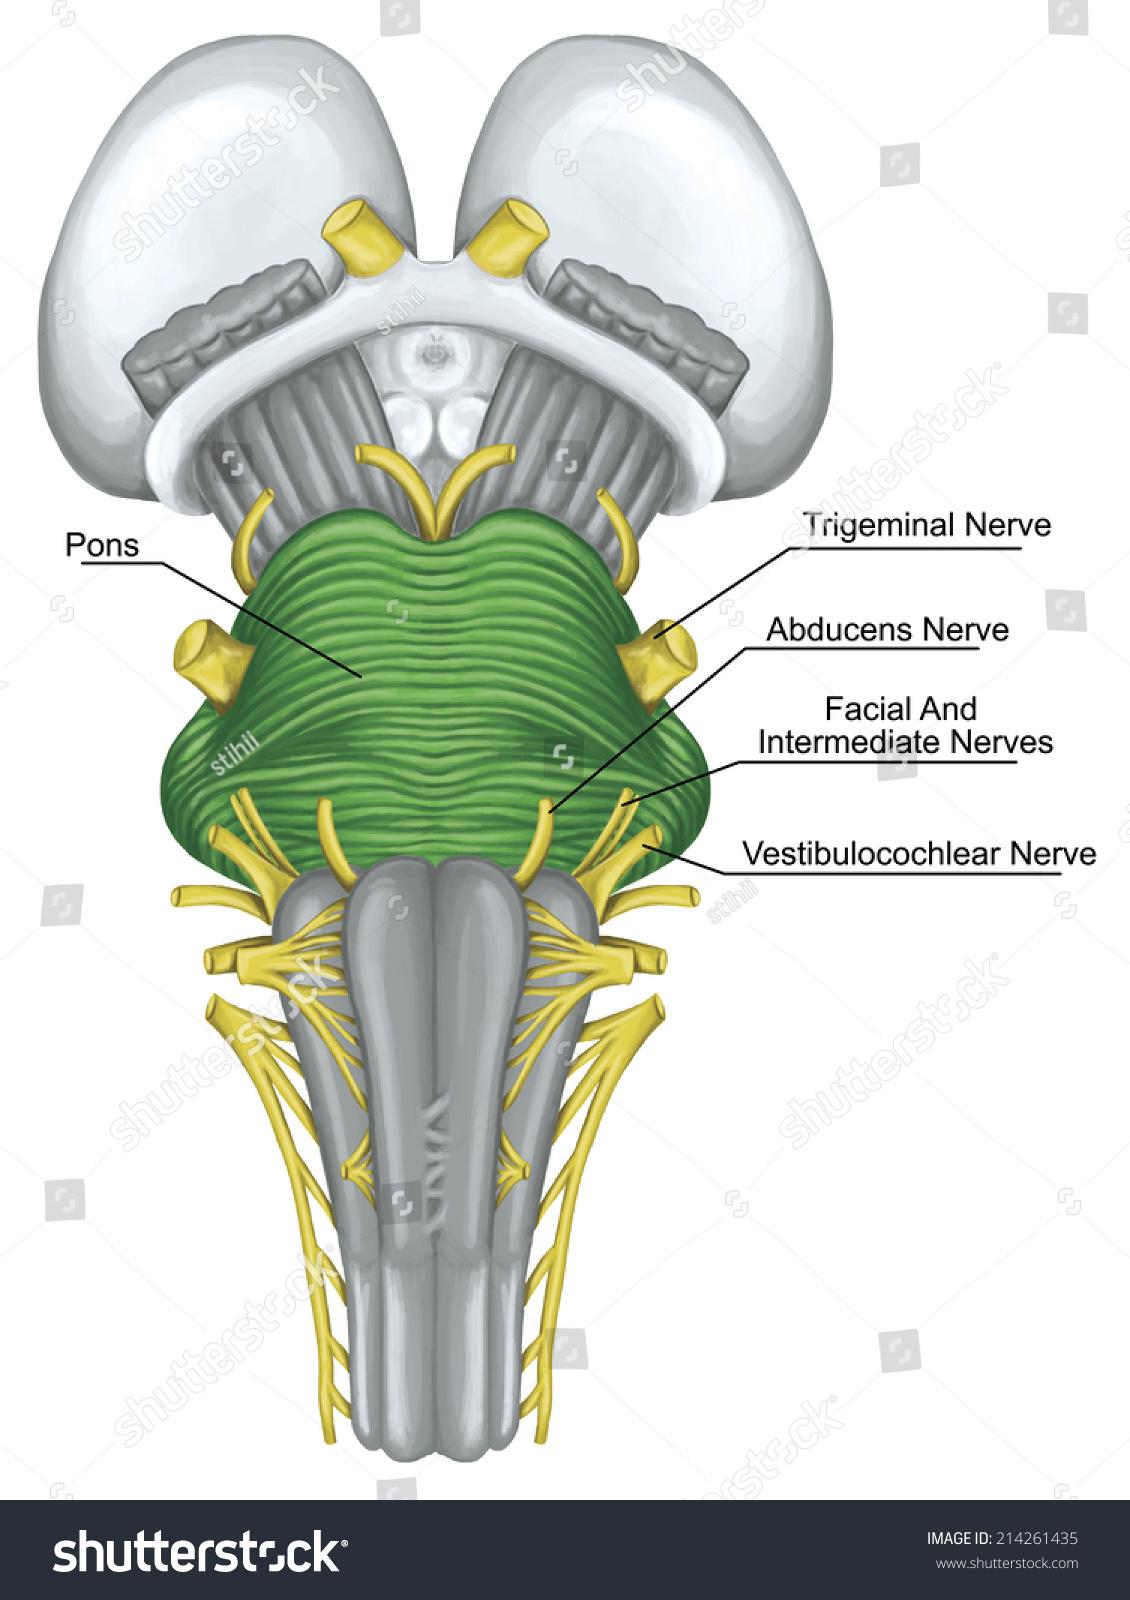 Pons Brainstem Brain Stem Ventral View Stock Illustration 214261435 ...